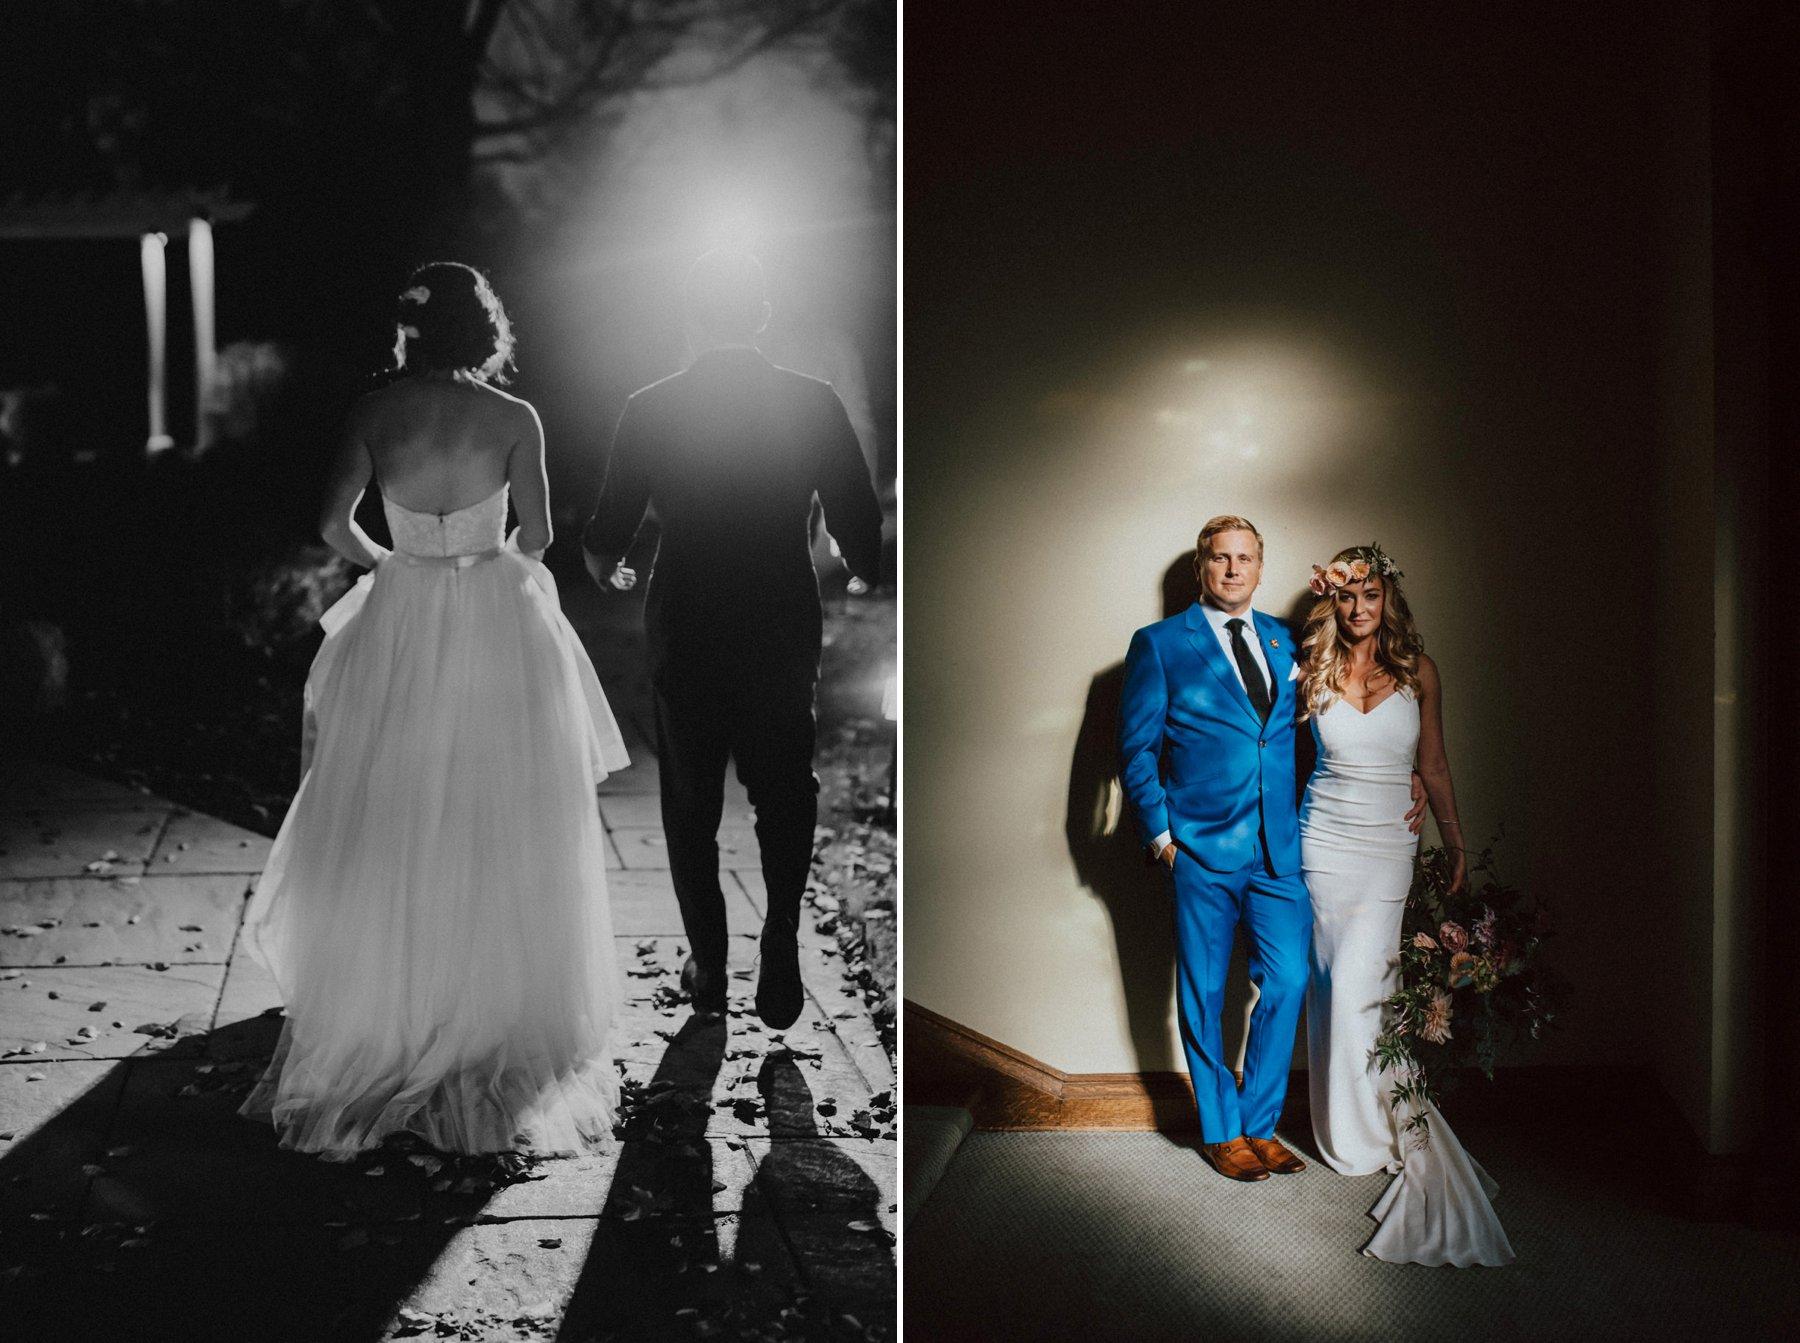 055-knowlton-mansion-wedding-16-2.jpg